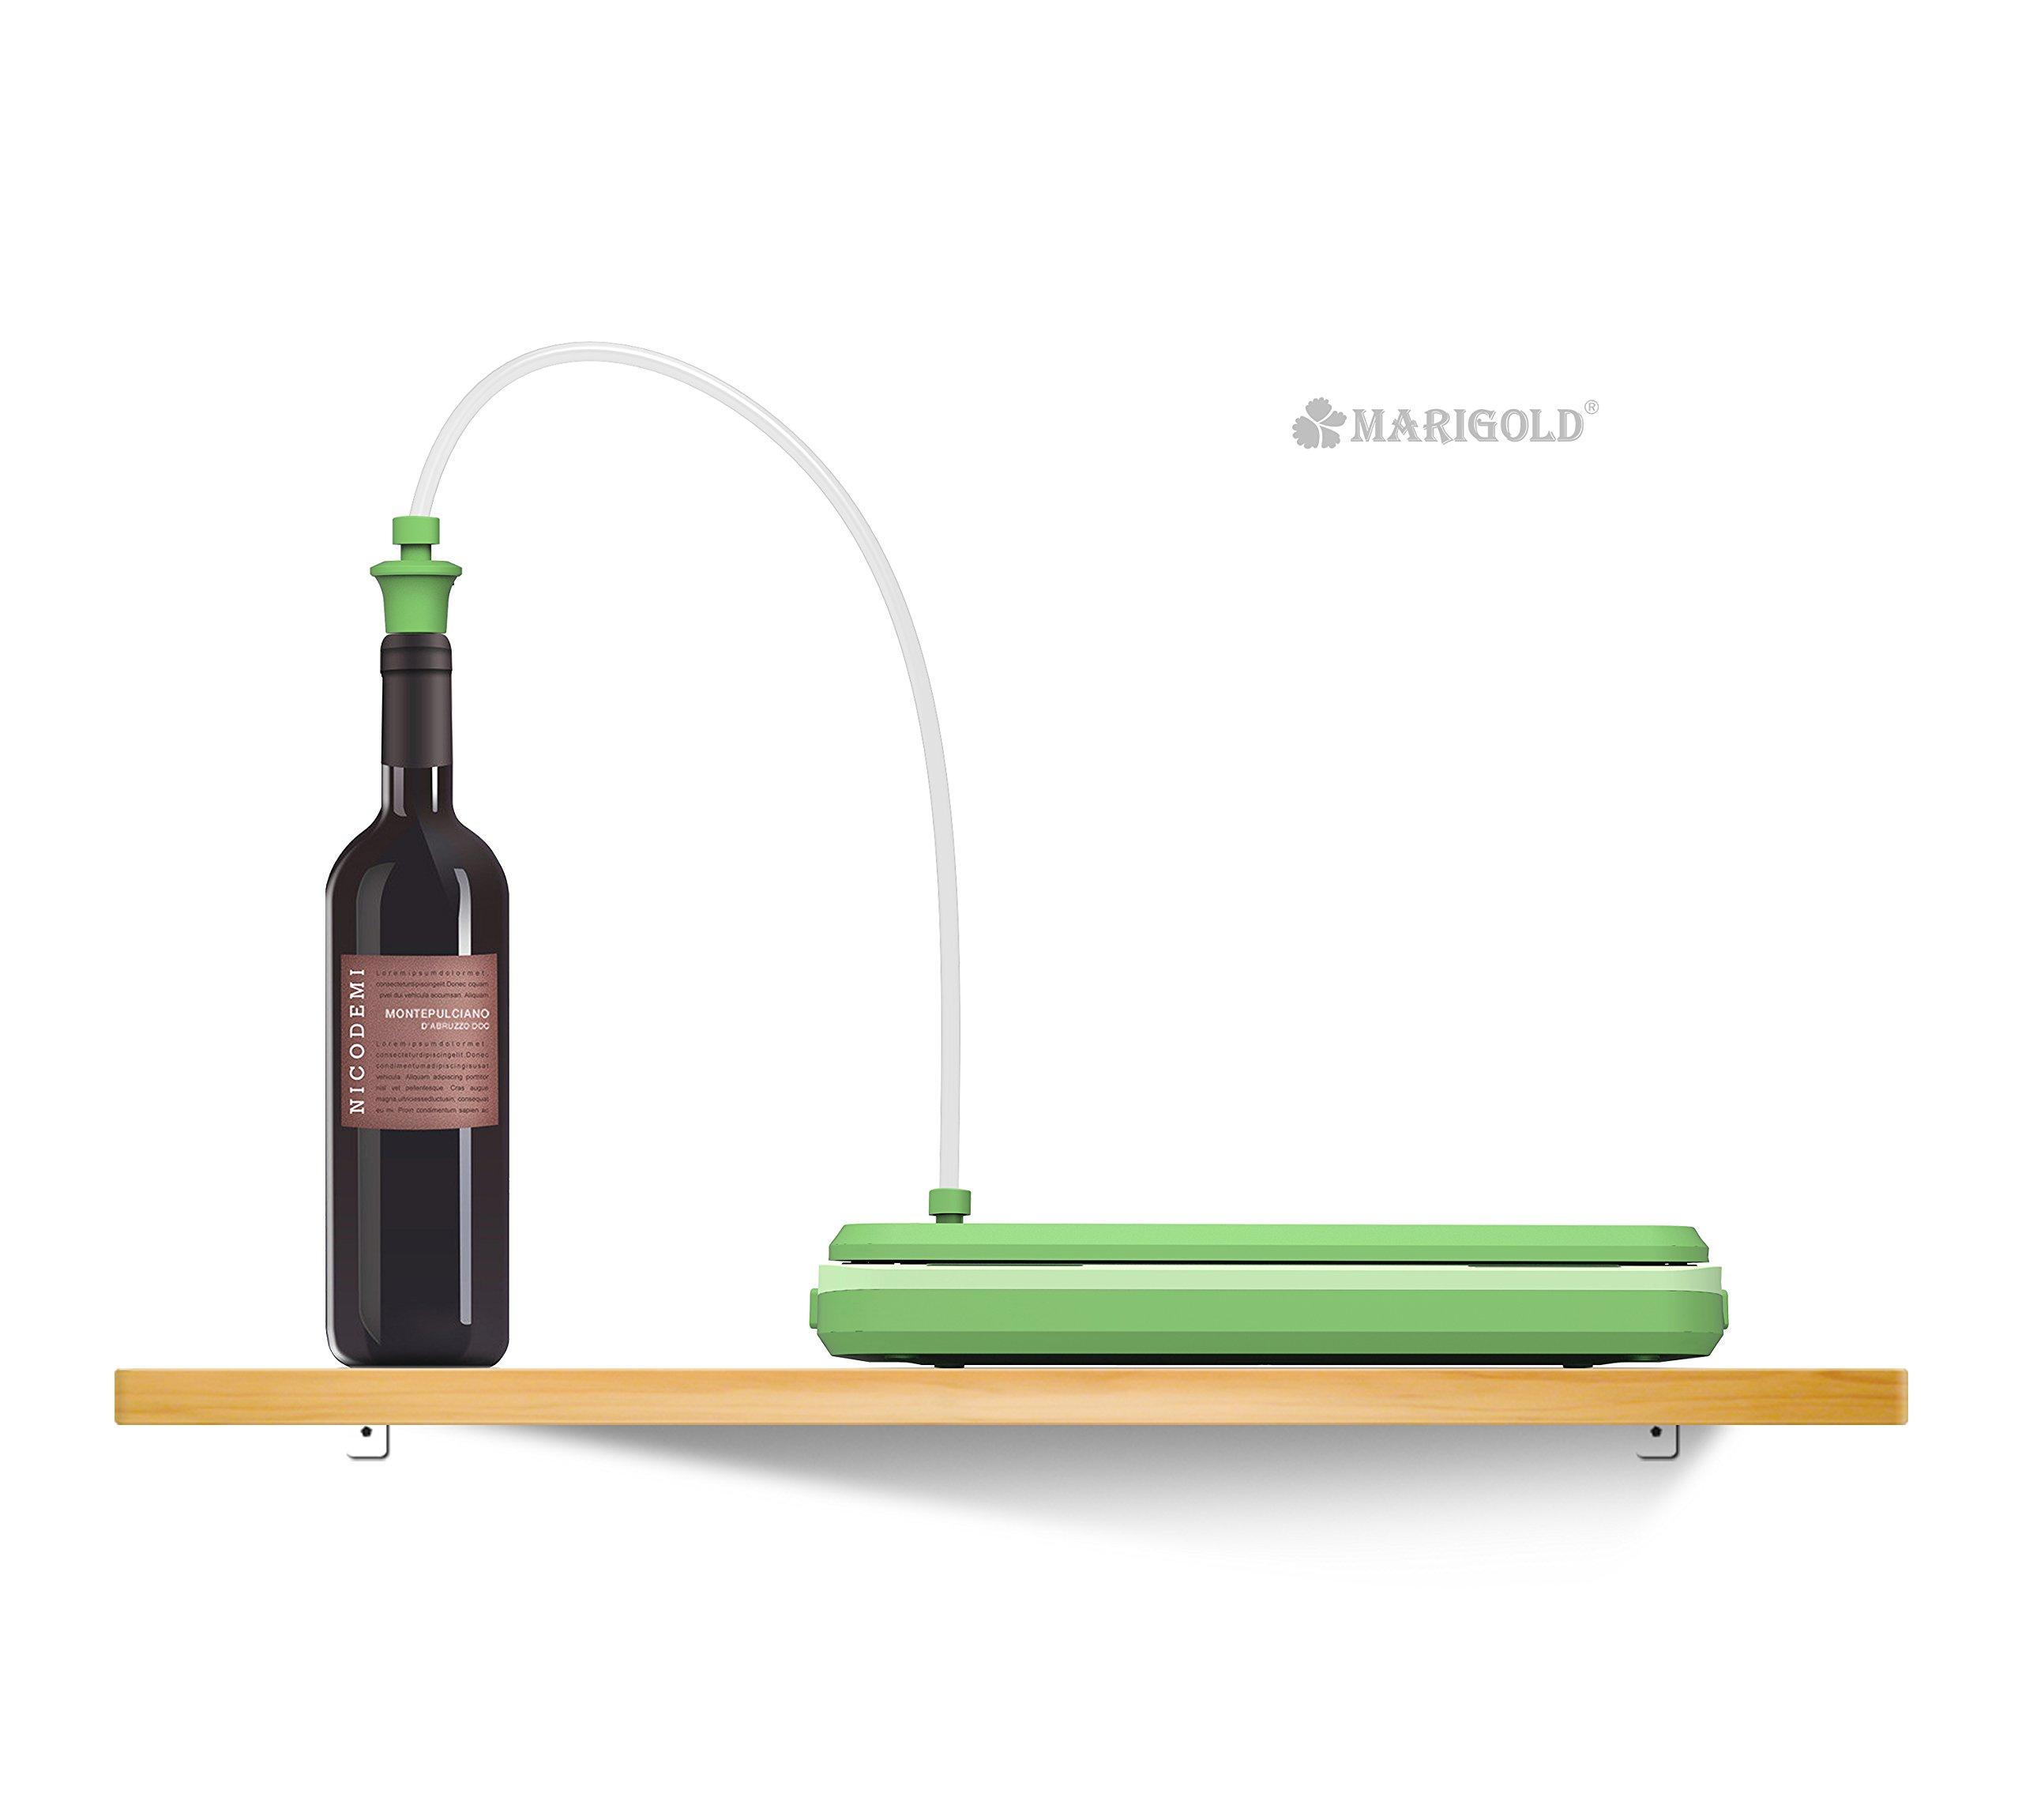 MARIGOLD Food Vacuum Sealer Machine w/Starter Kit (FVS1701) by MARIGOLD (Image #3)